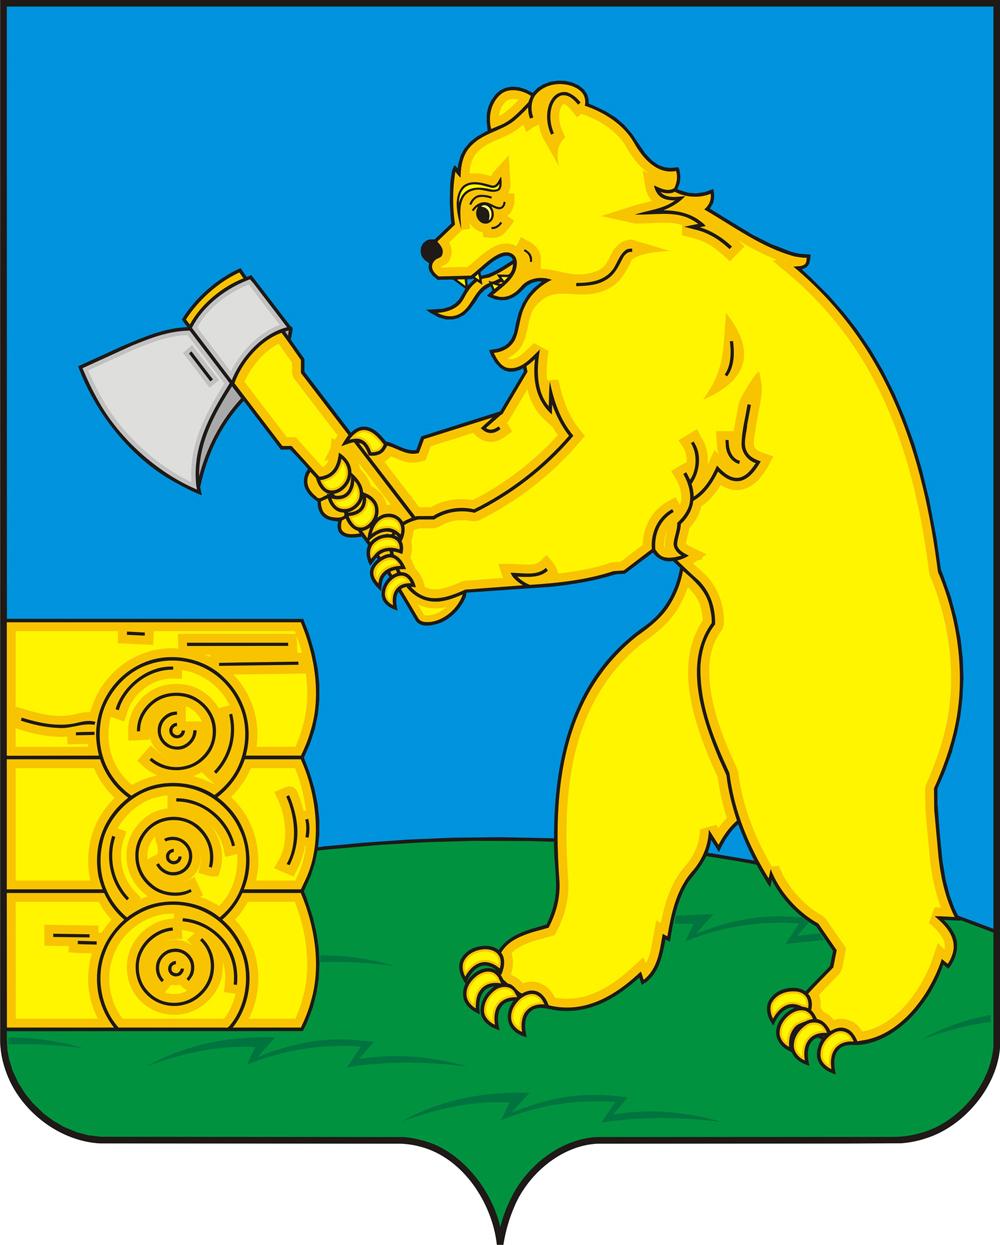 Medvjed-drvodjelja na grbu Baltasinskog rajona (Tatarstan, 780 km istočno od Moskve). Balta je na tatarskom sjekira, a medvjed je simbol prirode i moći. Izvor: Lori / Legion-Media